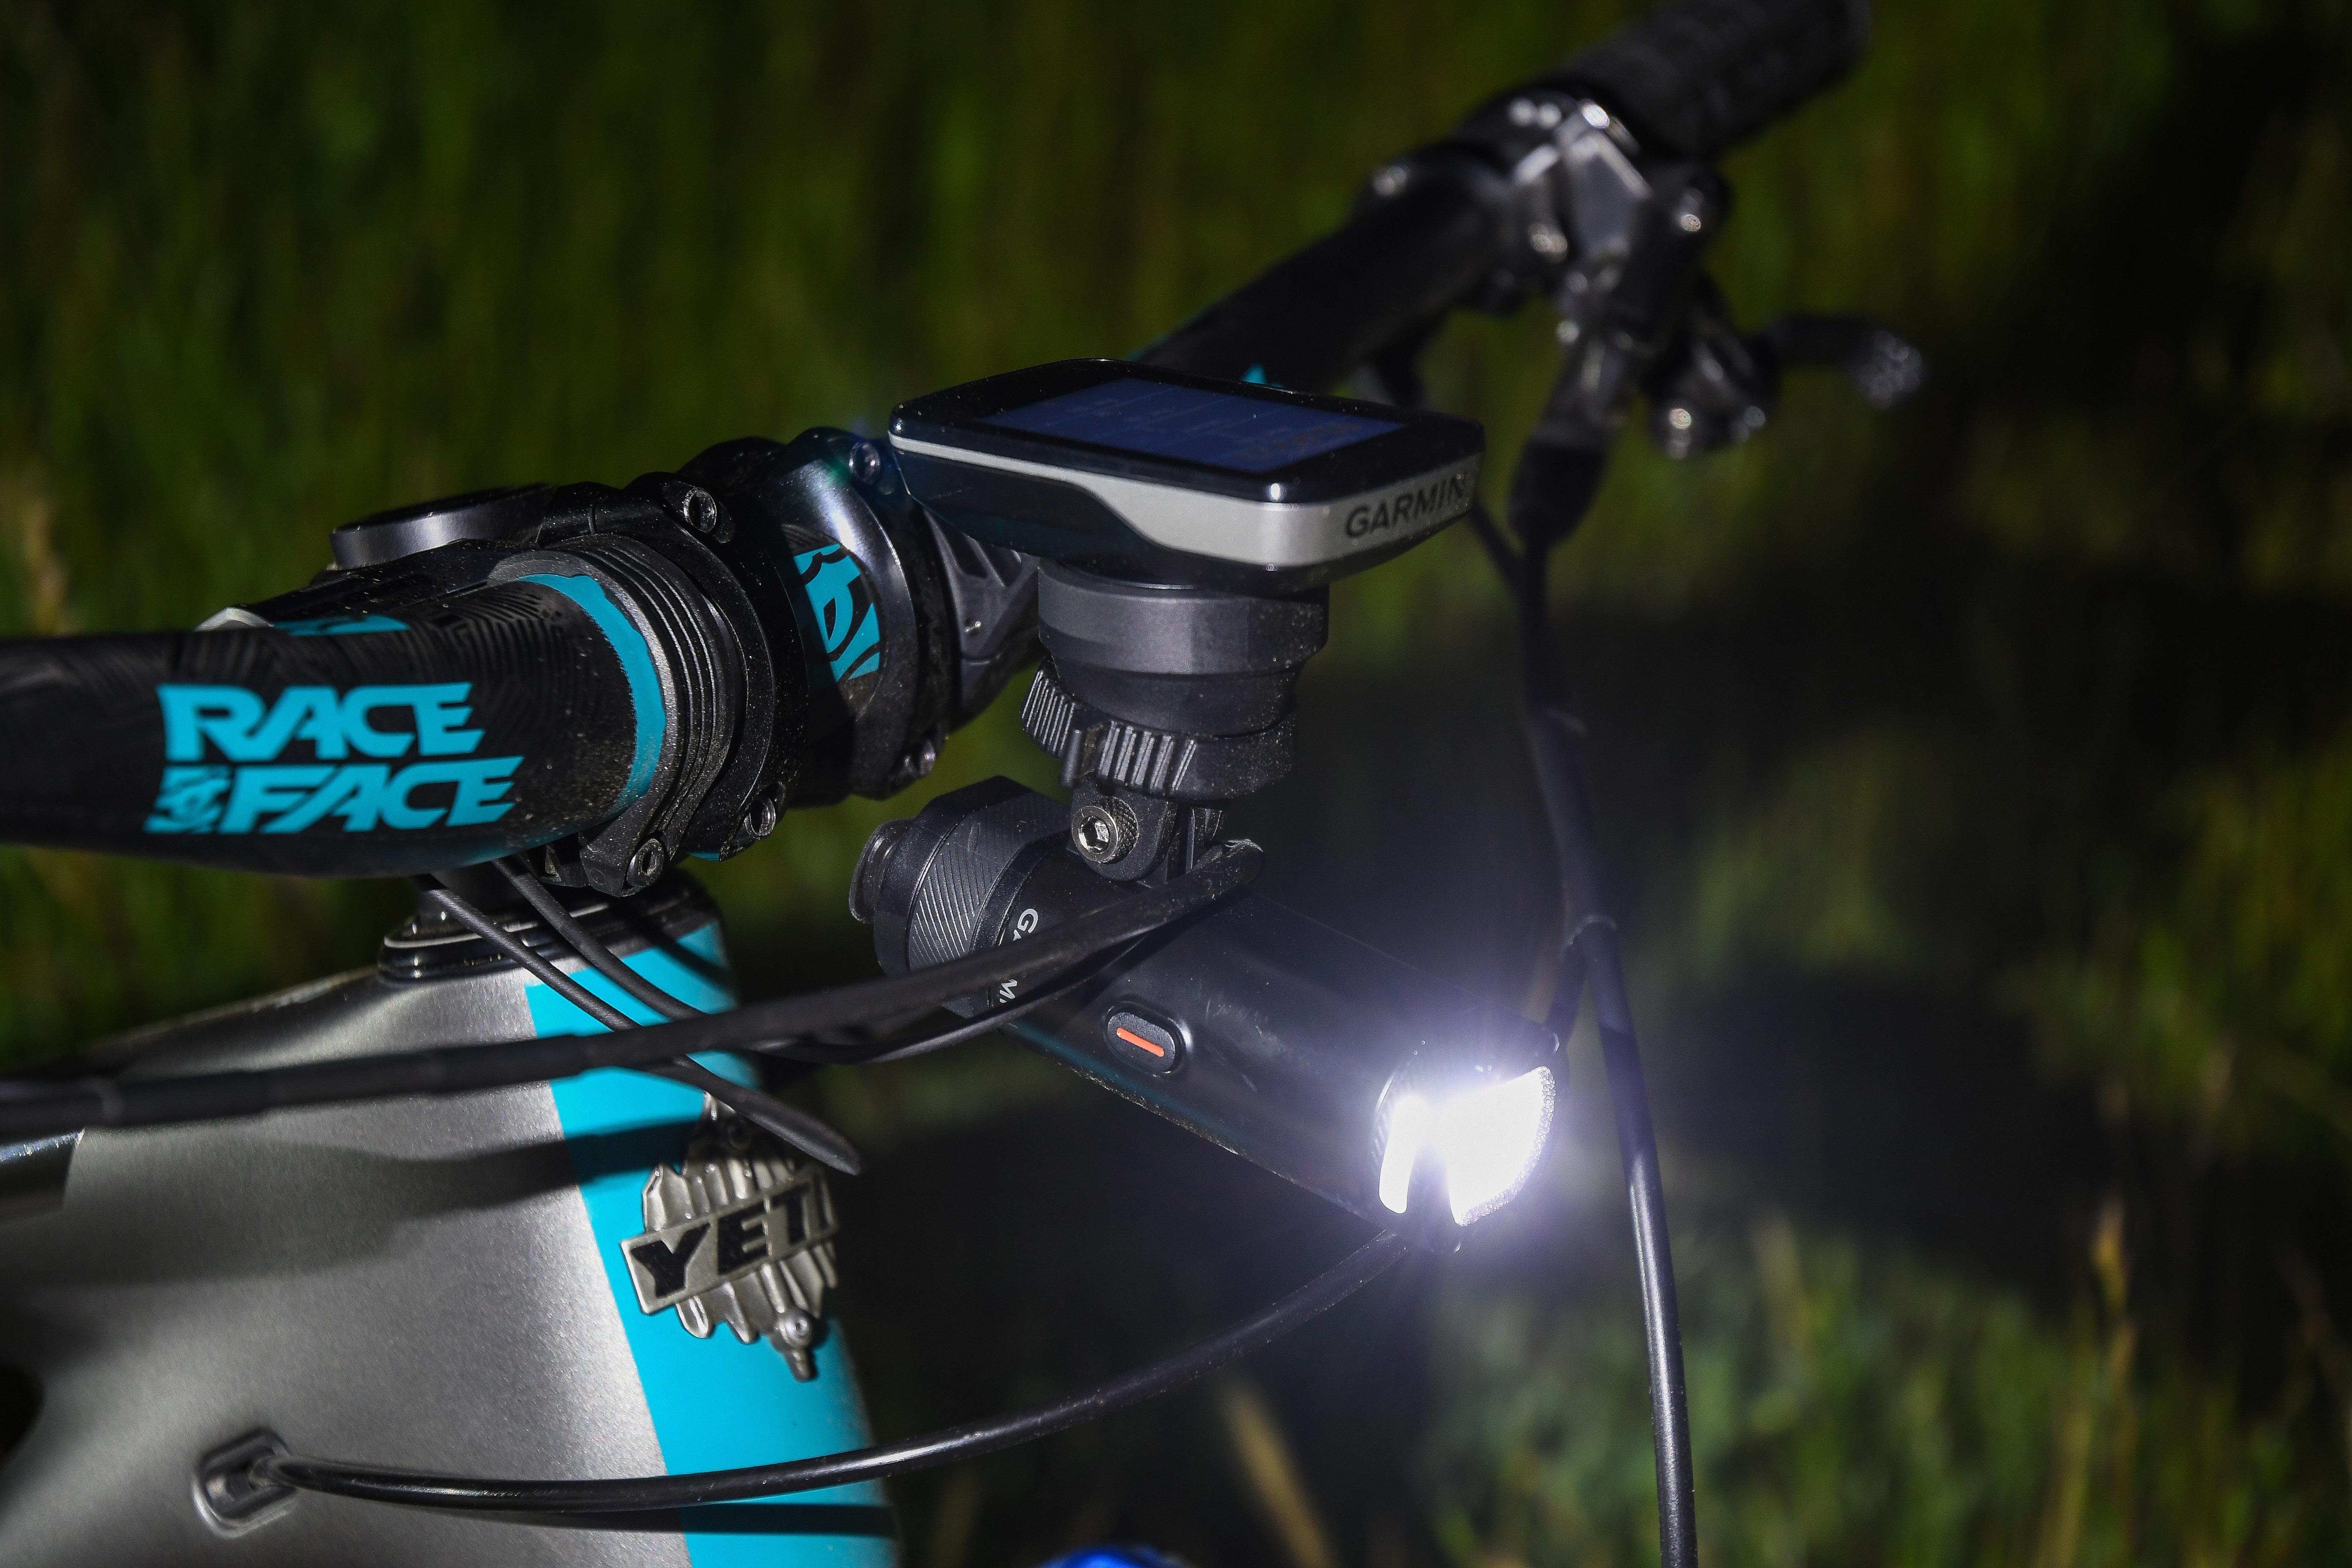 tflcu road bike legal sl street light asp a bicycle ready headlight